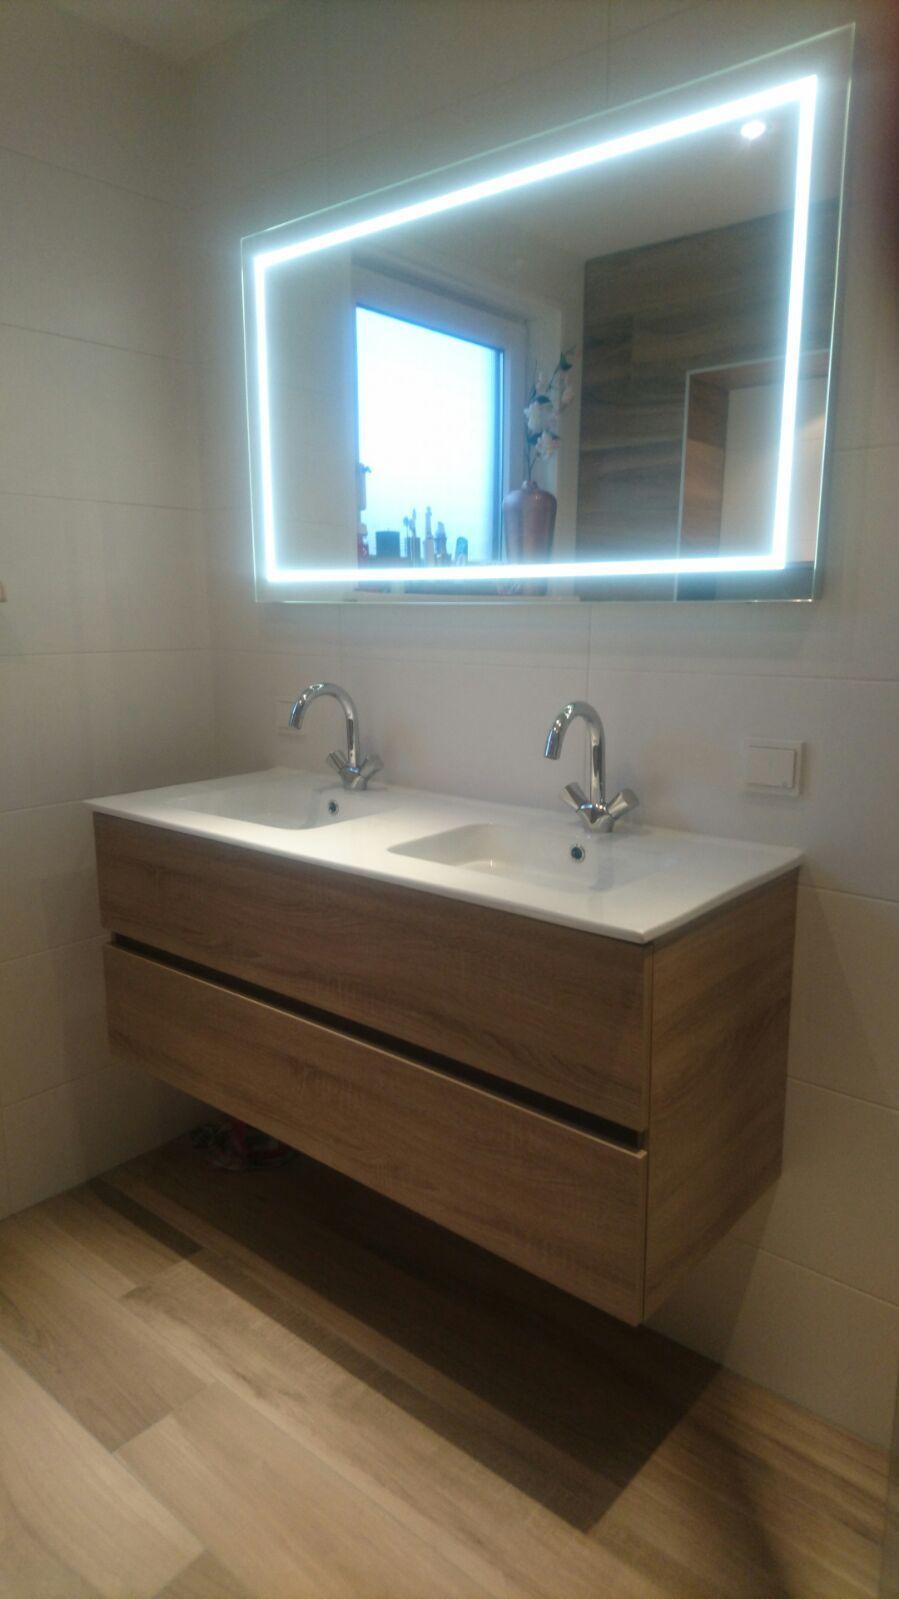 Modern badkamer meubel in hout kleur met dubbele wastafel en ...